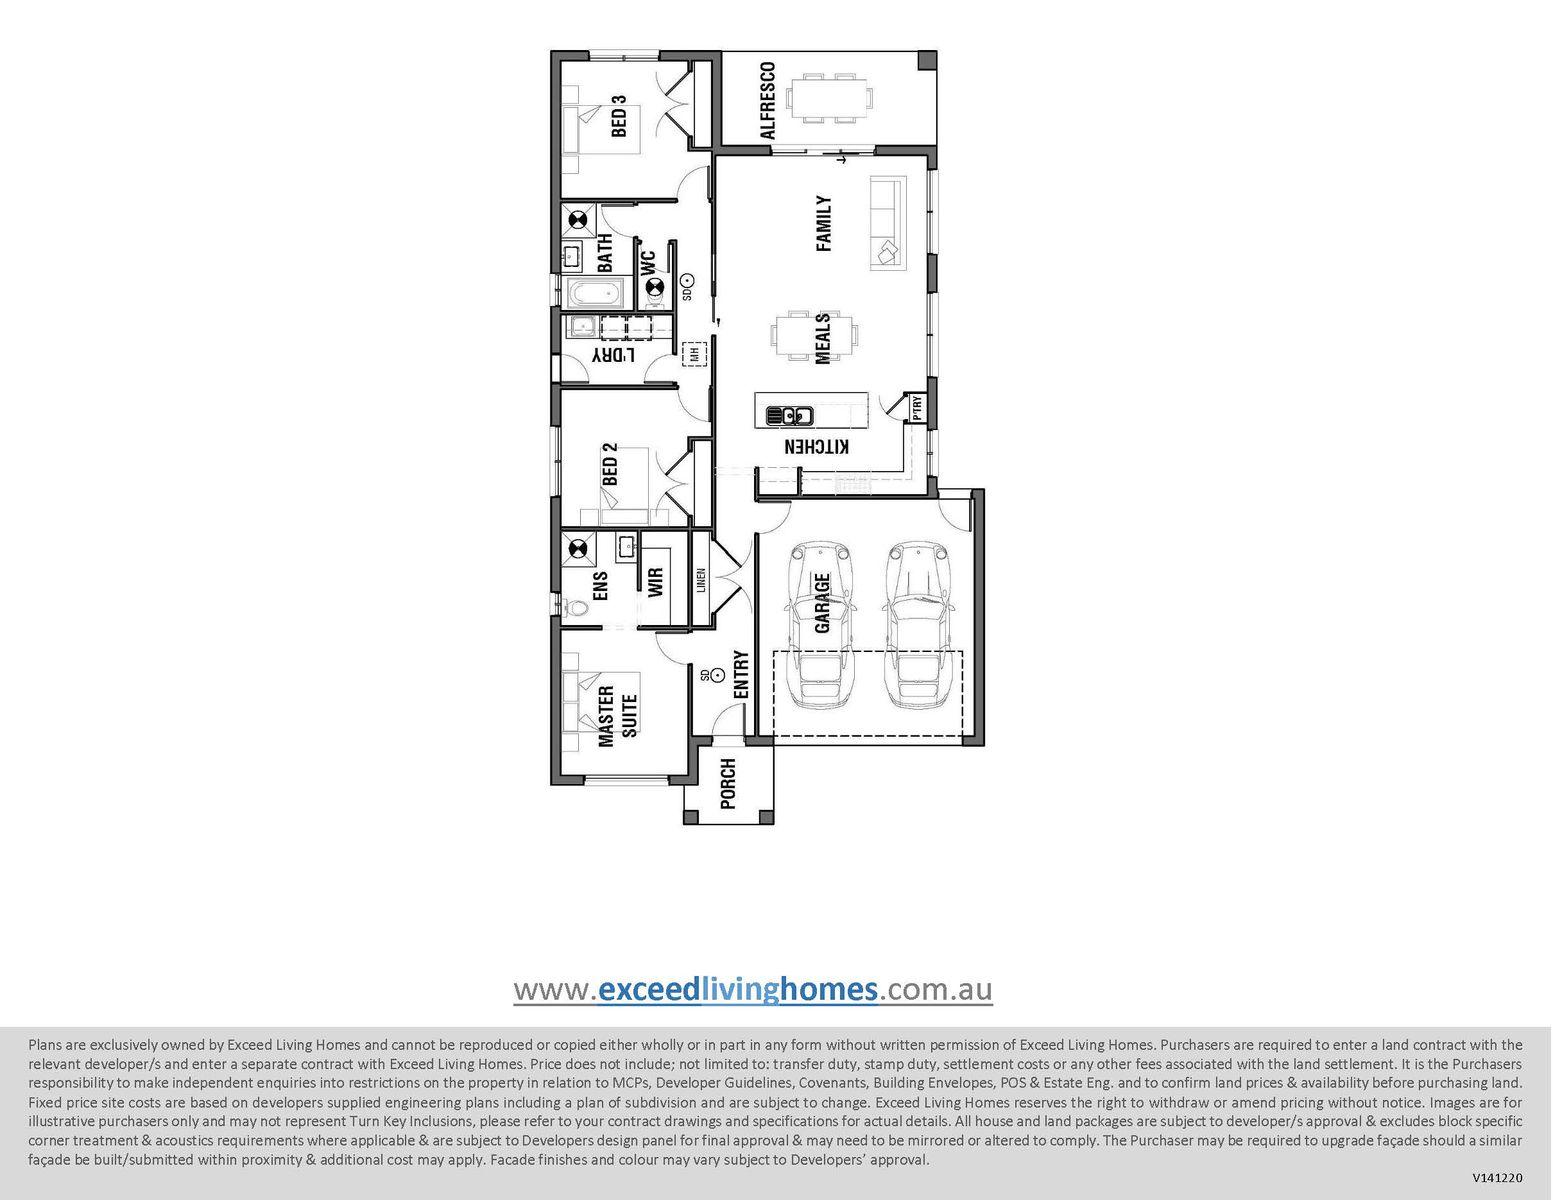 Lot 801 Elpis Road, Melton South, VIC 3338